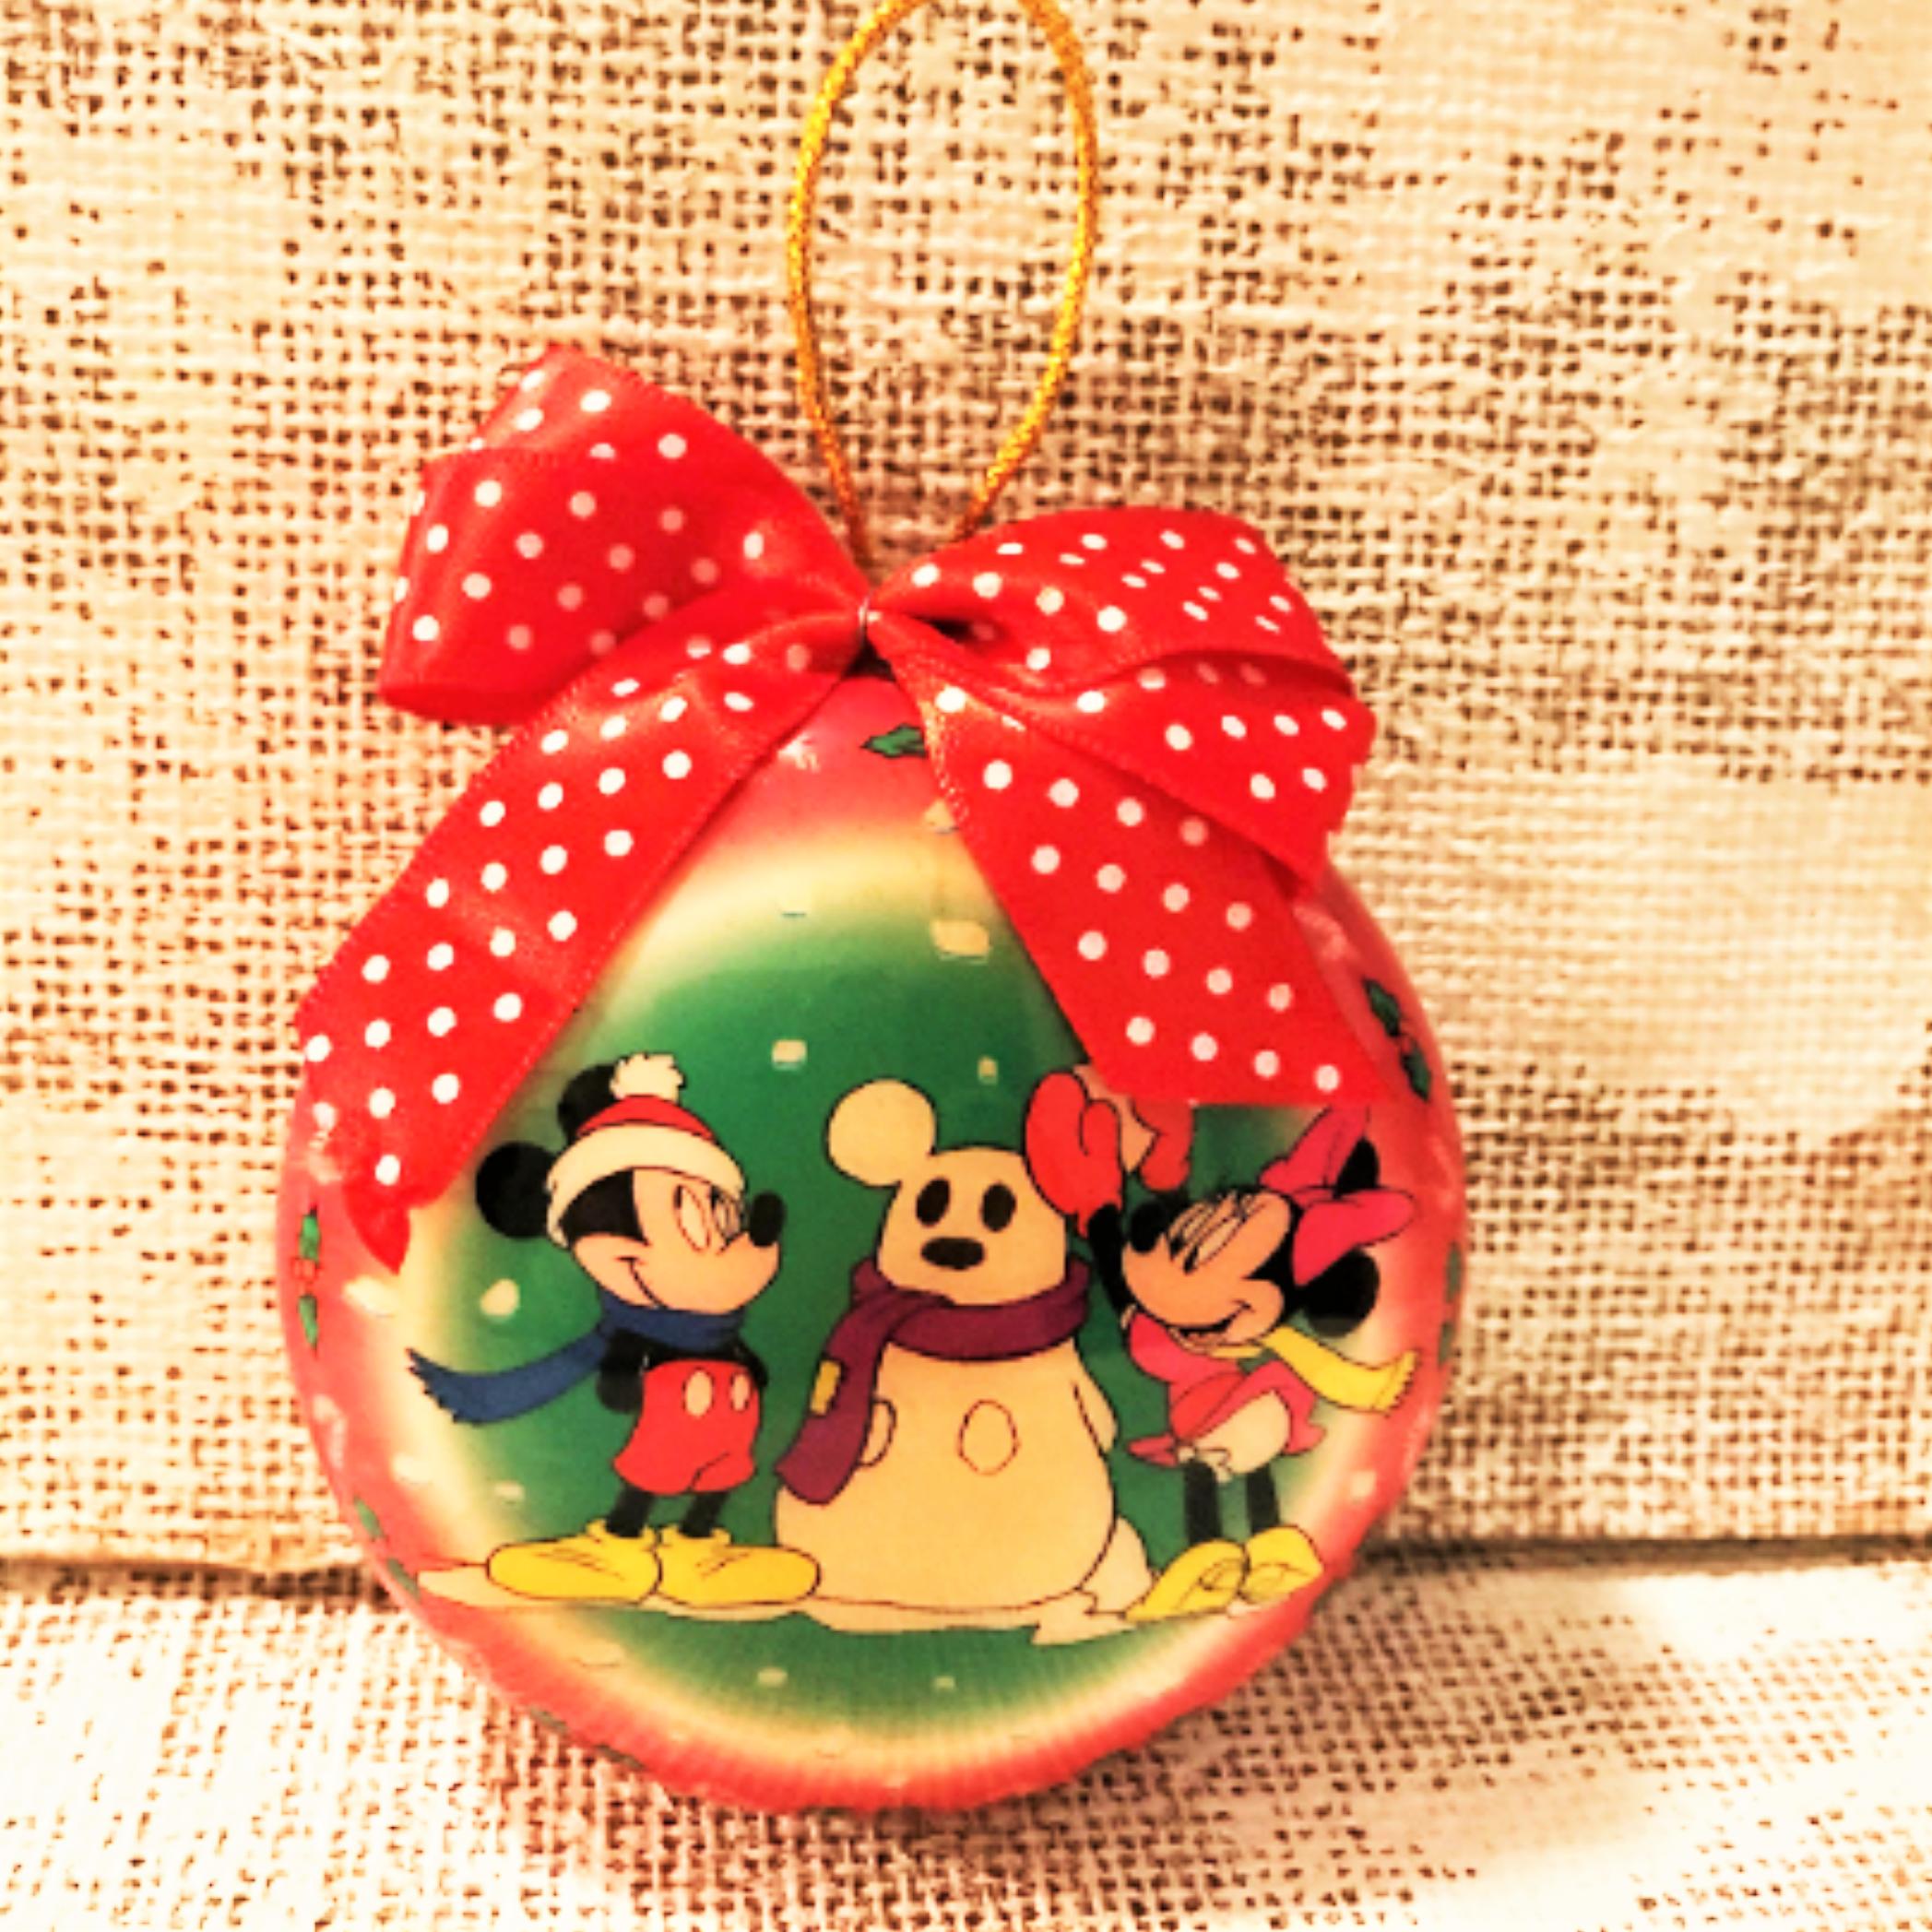 Mickey Mouse Christmas Ornament Mickey Minnie Mouse Disney Etsy In 2020 Mickey Mouse Ornaments Mickey Mouse Christmas Ornament Mickey Mouse Christmas